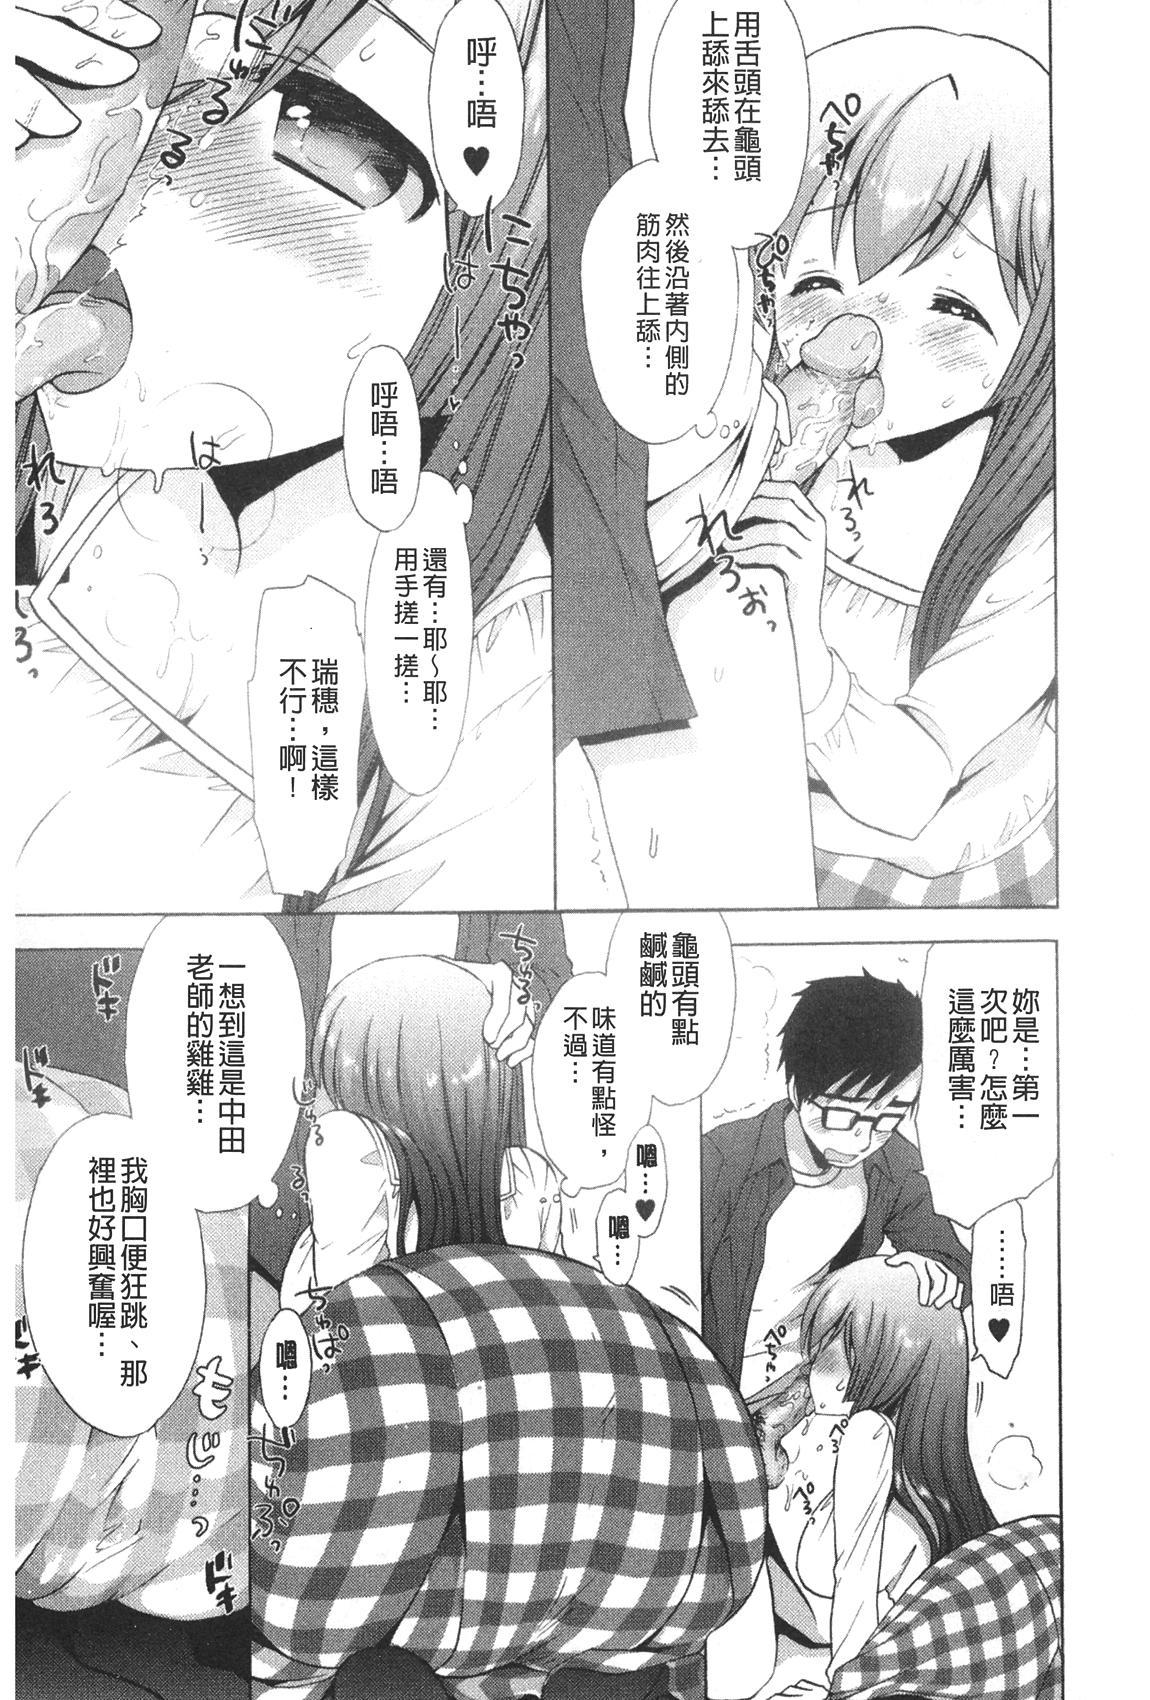 Icha Love! | 稚嫩女之愛! 43